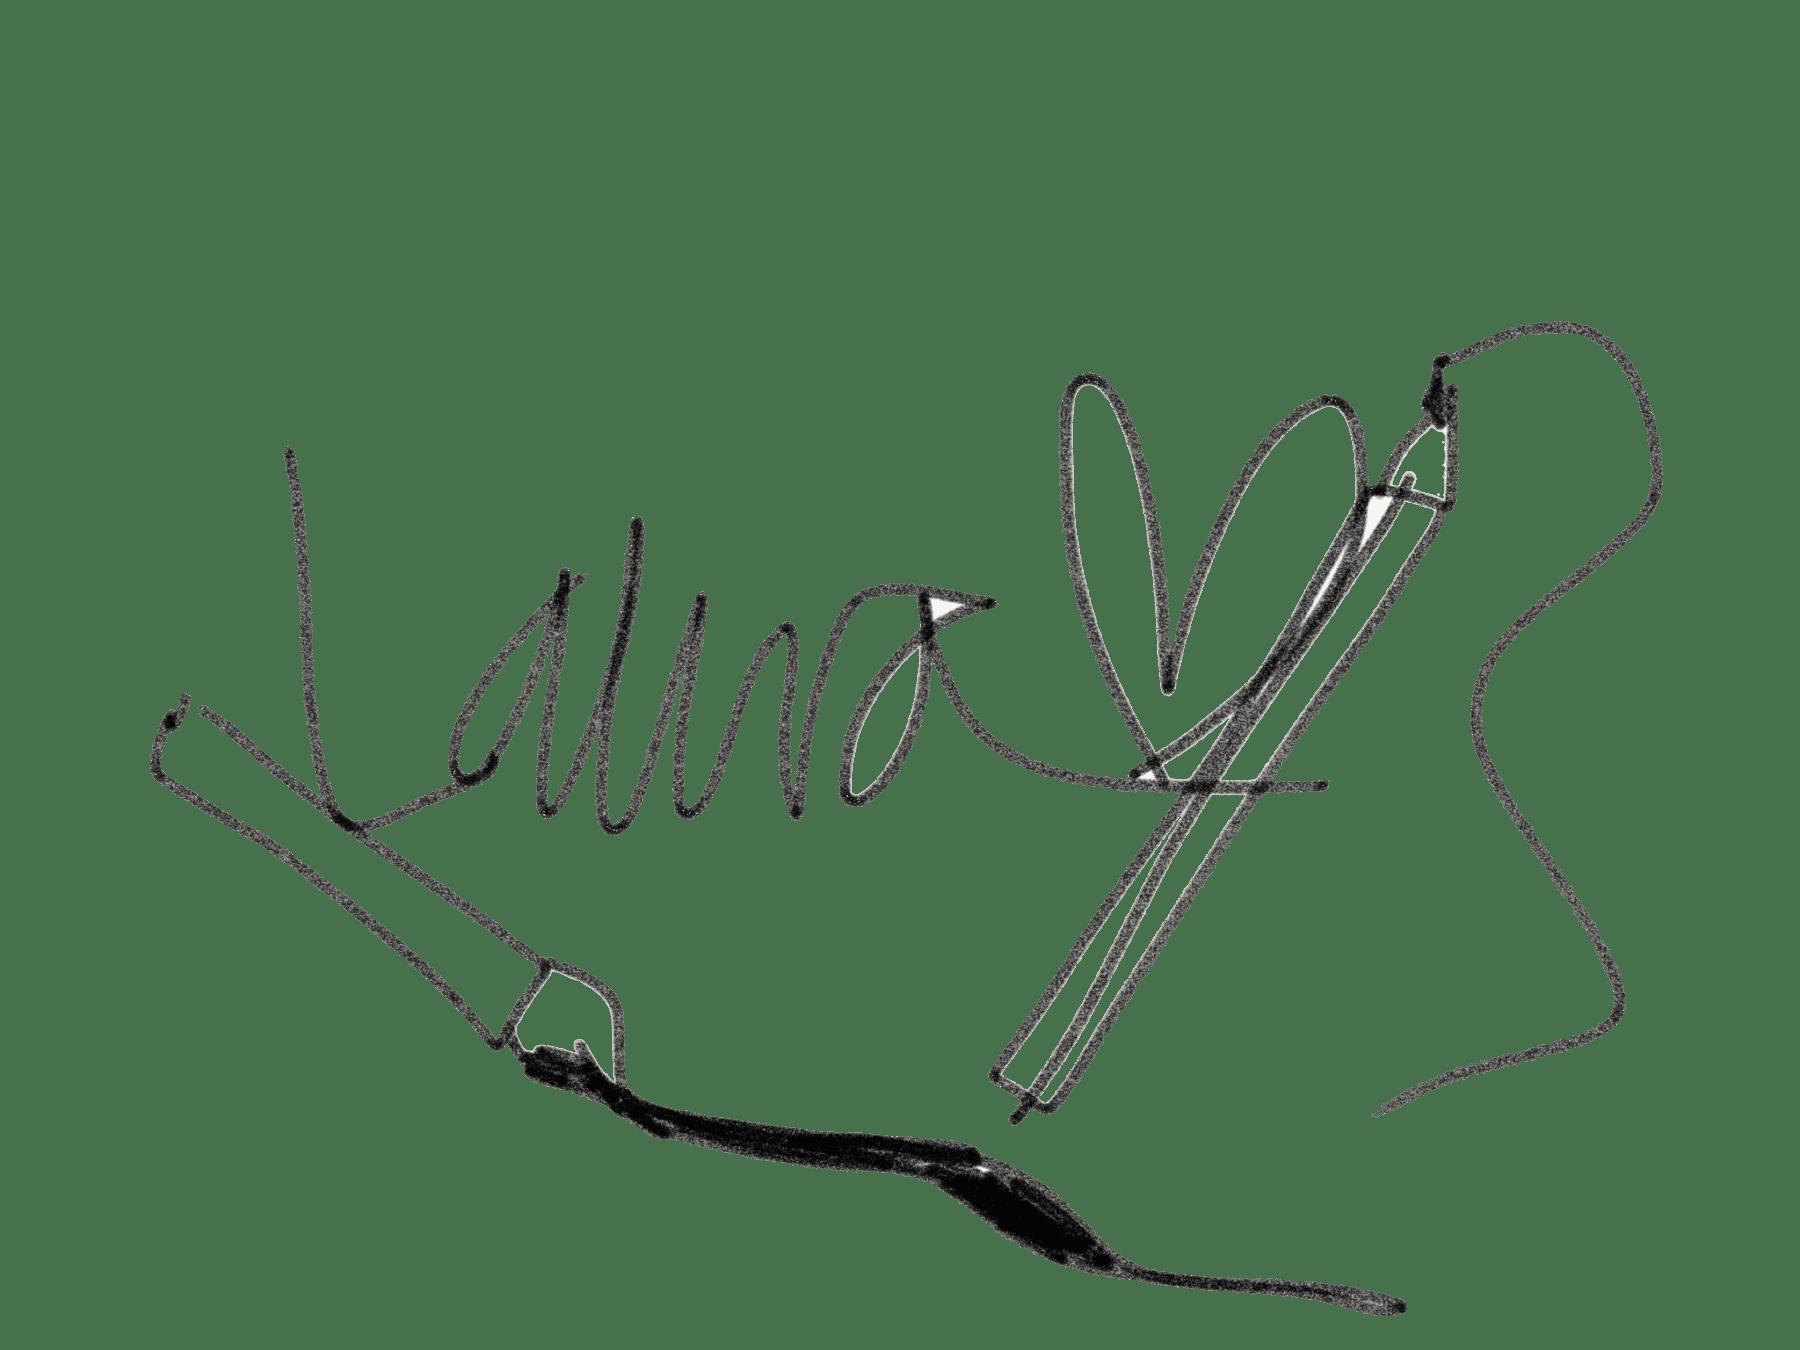 Digital Fashion Illustration On The Ipad